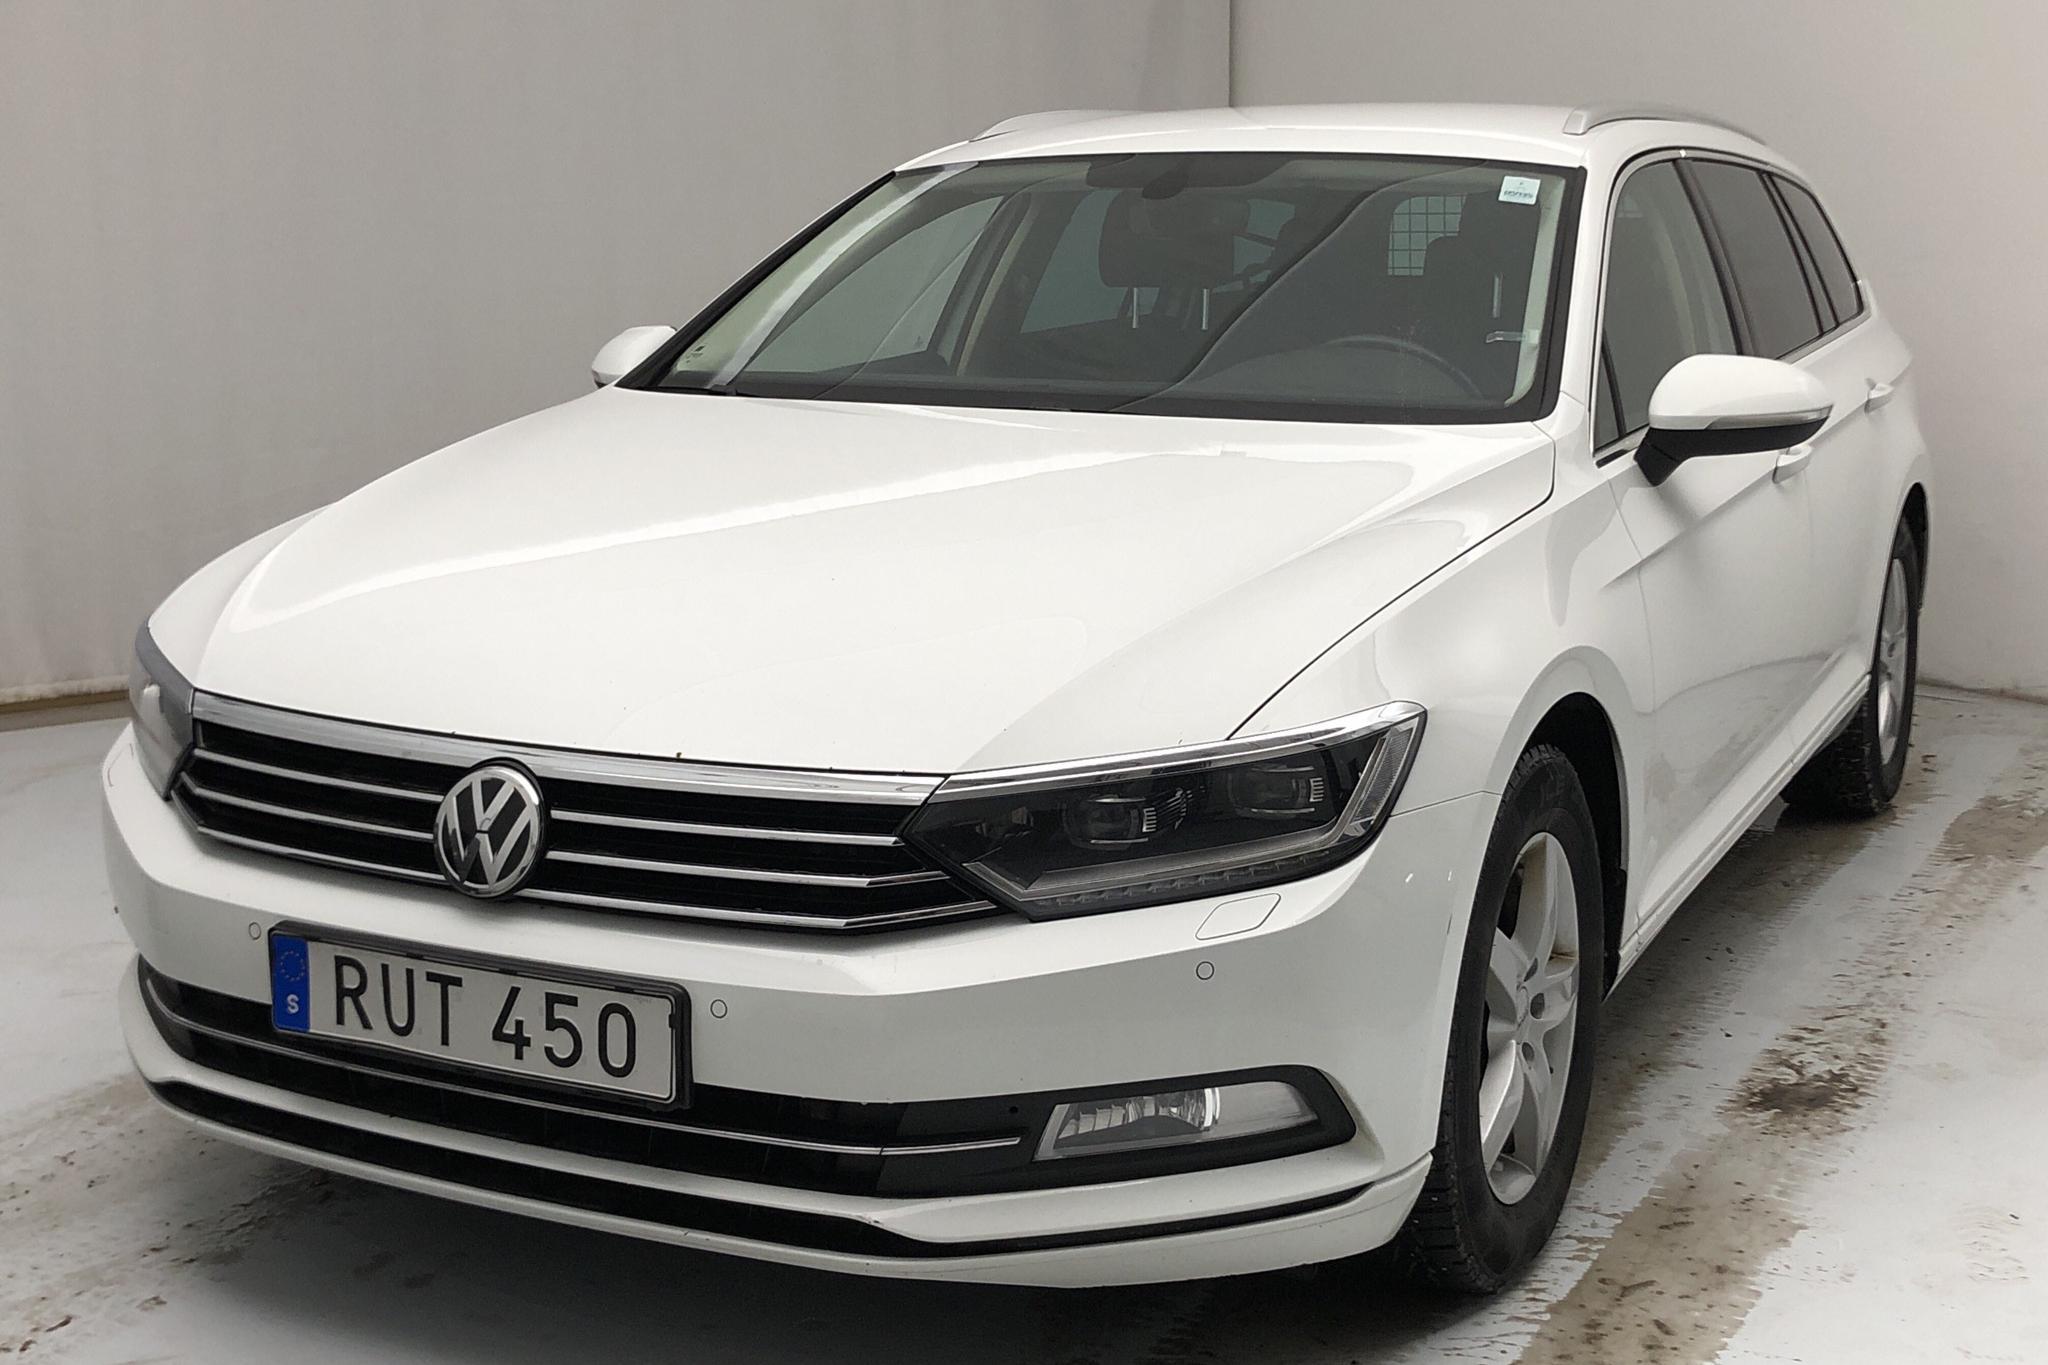 VW Passat 2.0 TDI Sportscombi (150hk) - 146 750 km - Automatic - white - 2017